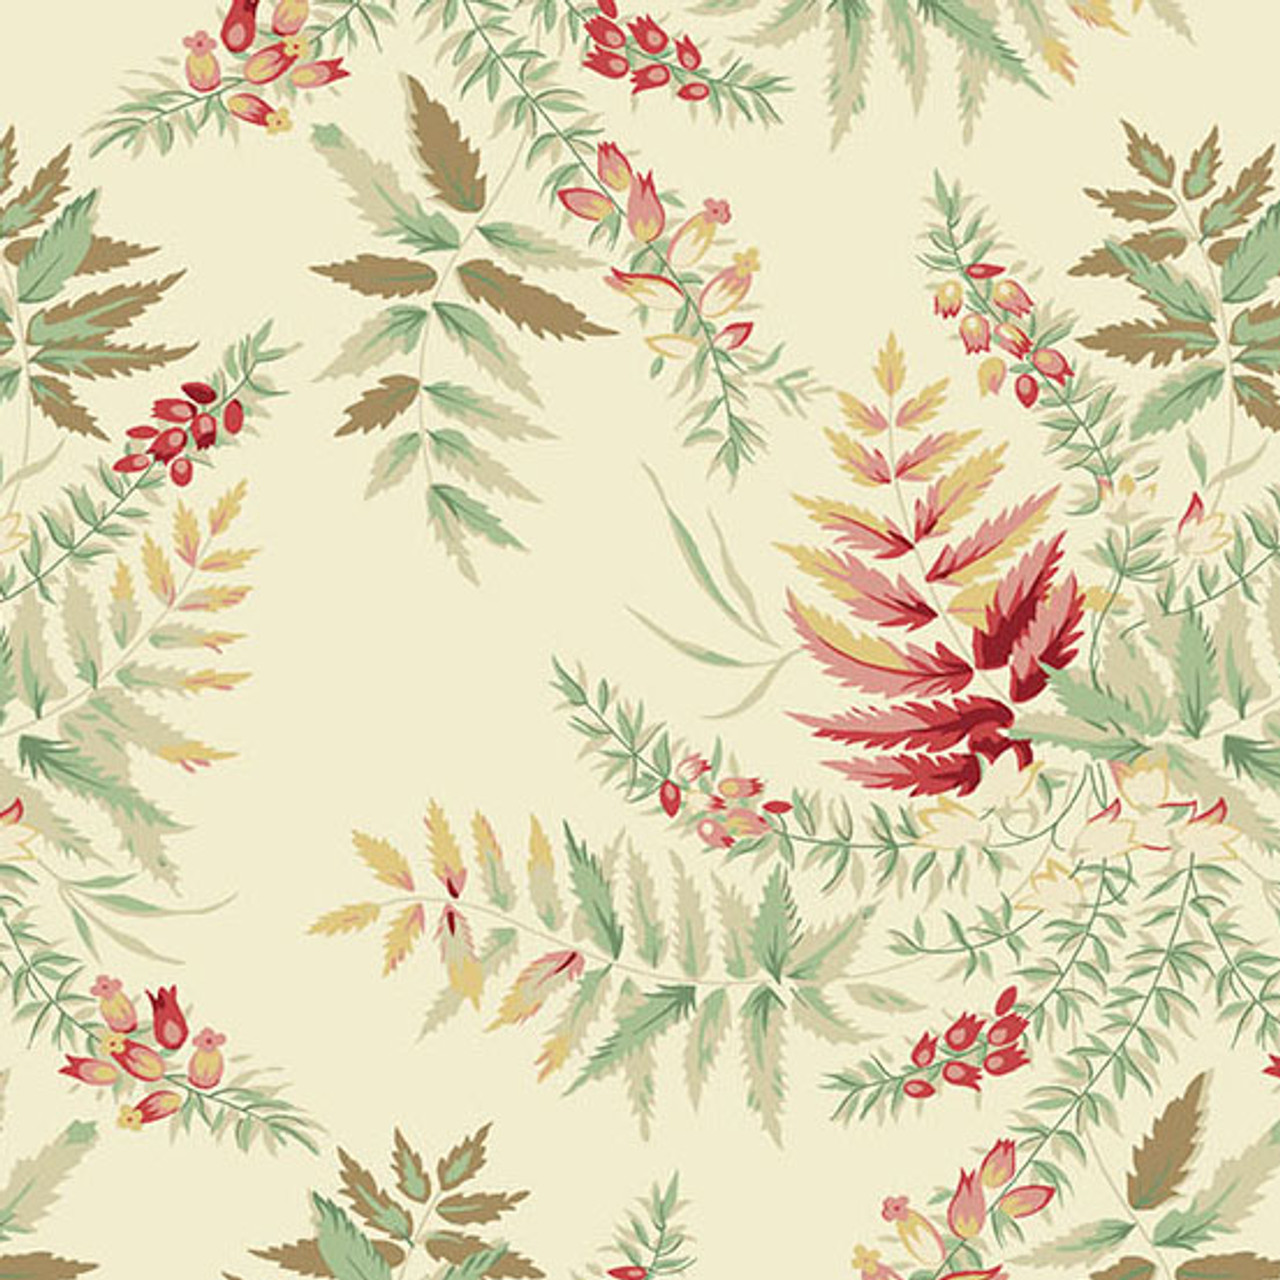 Edyta Sitar, Laundry Basket Quilts : The Seamstress, Fern - Parchment